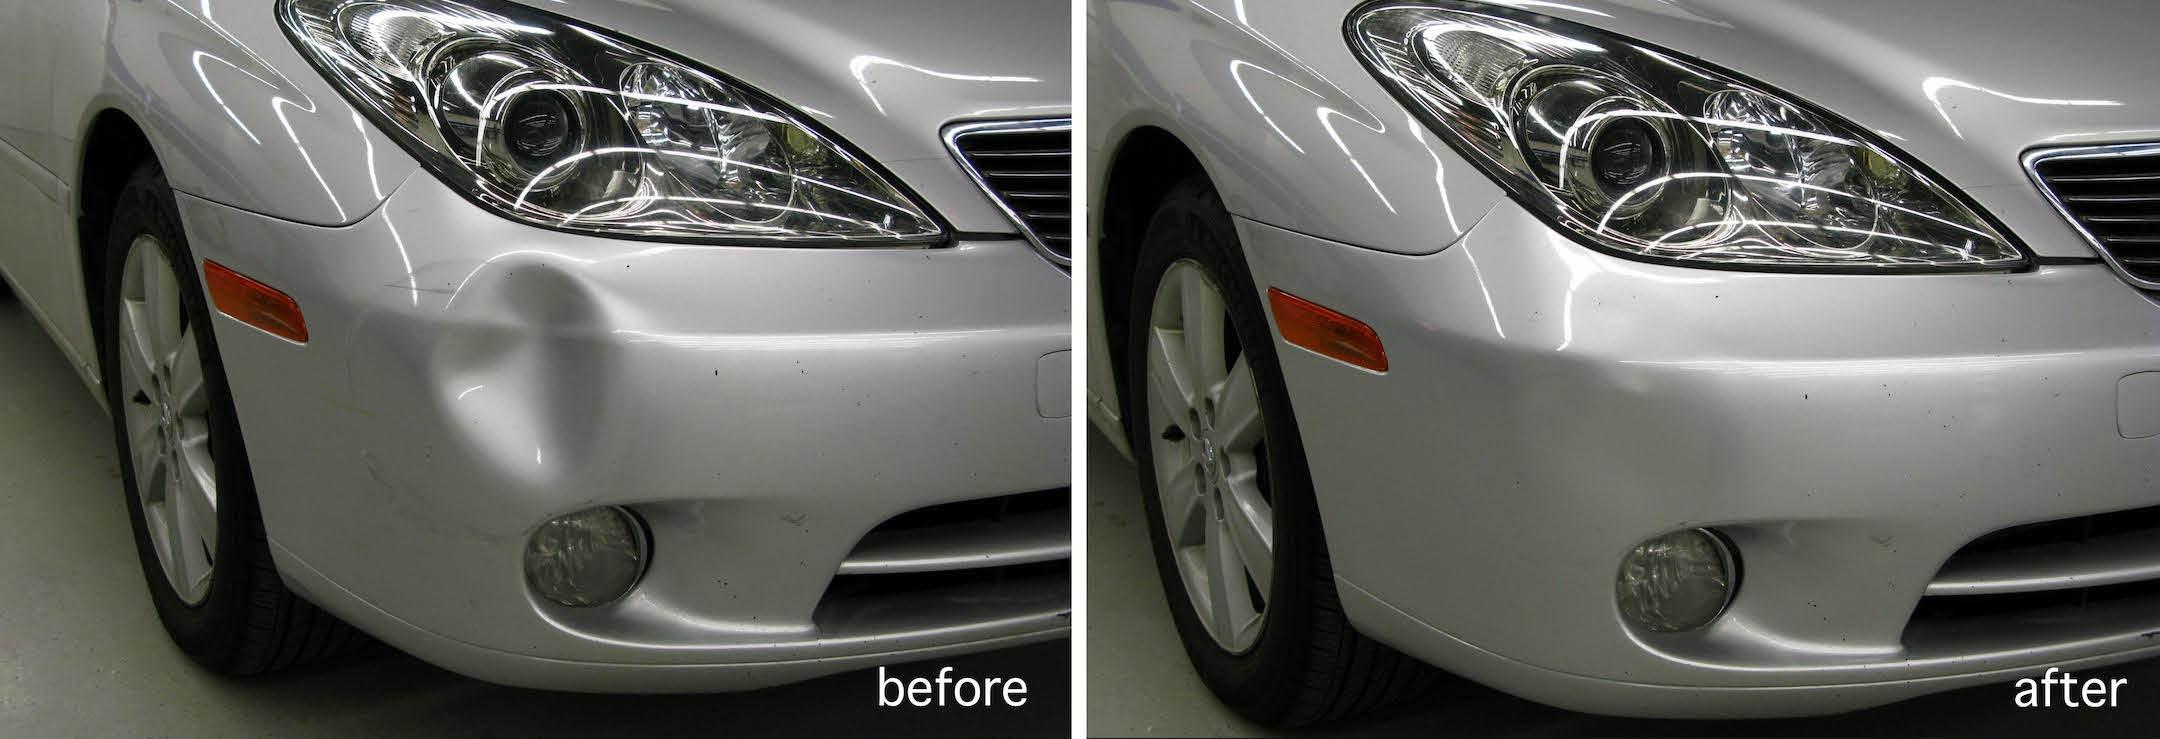 Nick 'n Chips cosmetic paint  toledo ohio auto body repair